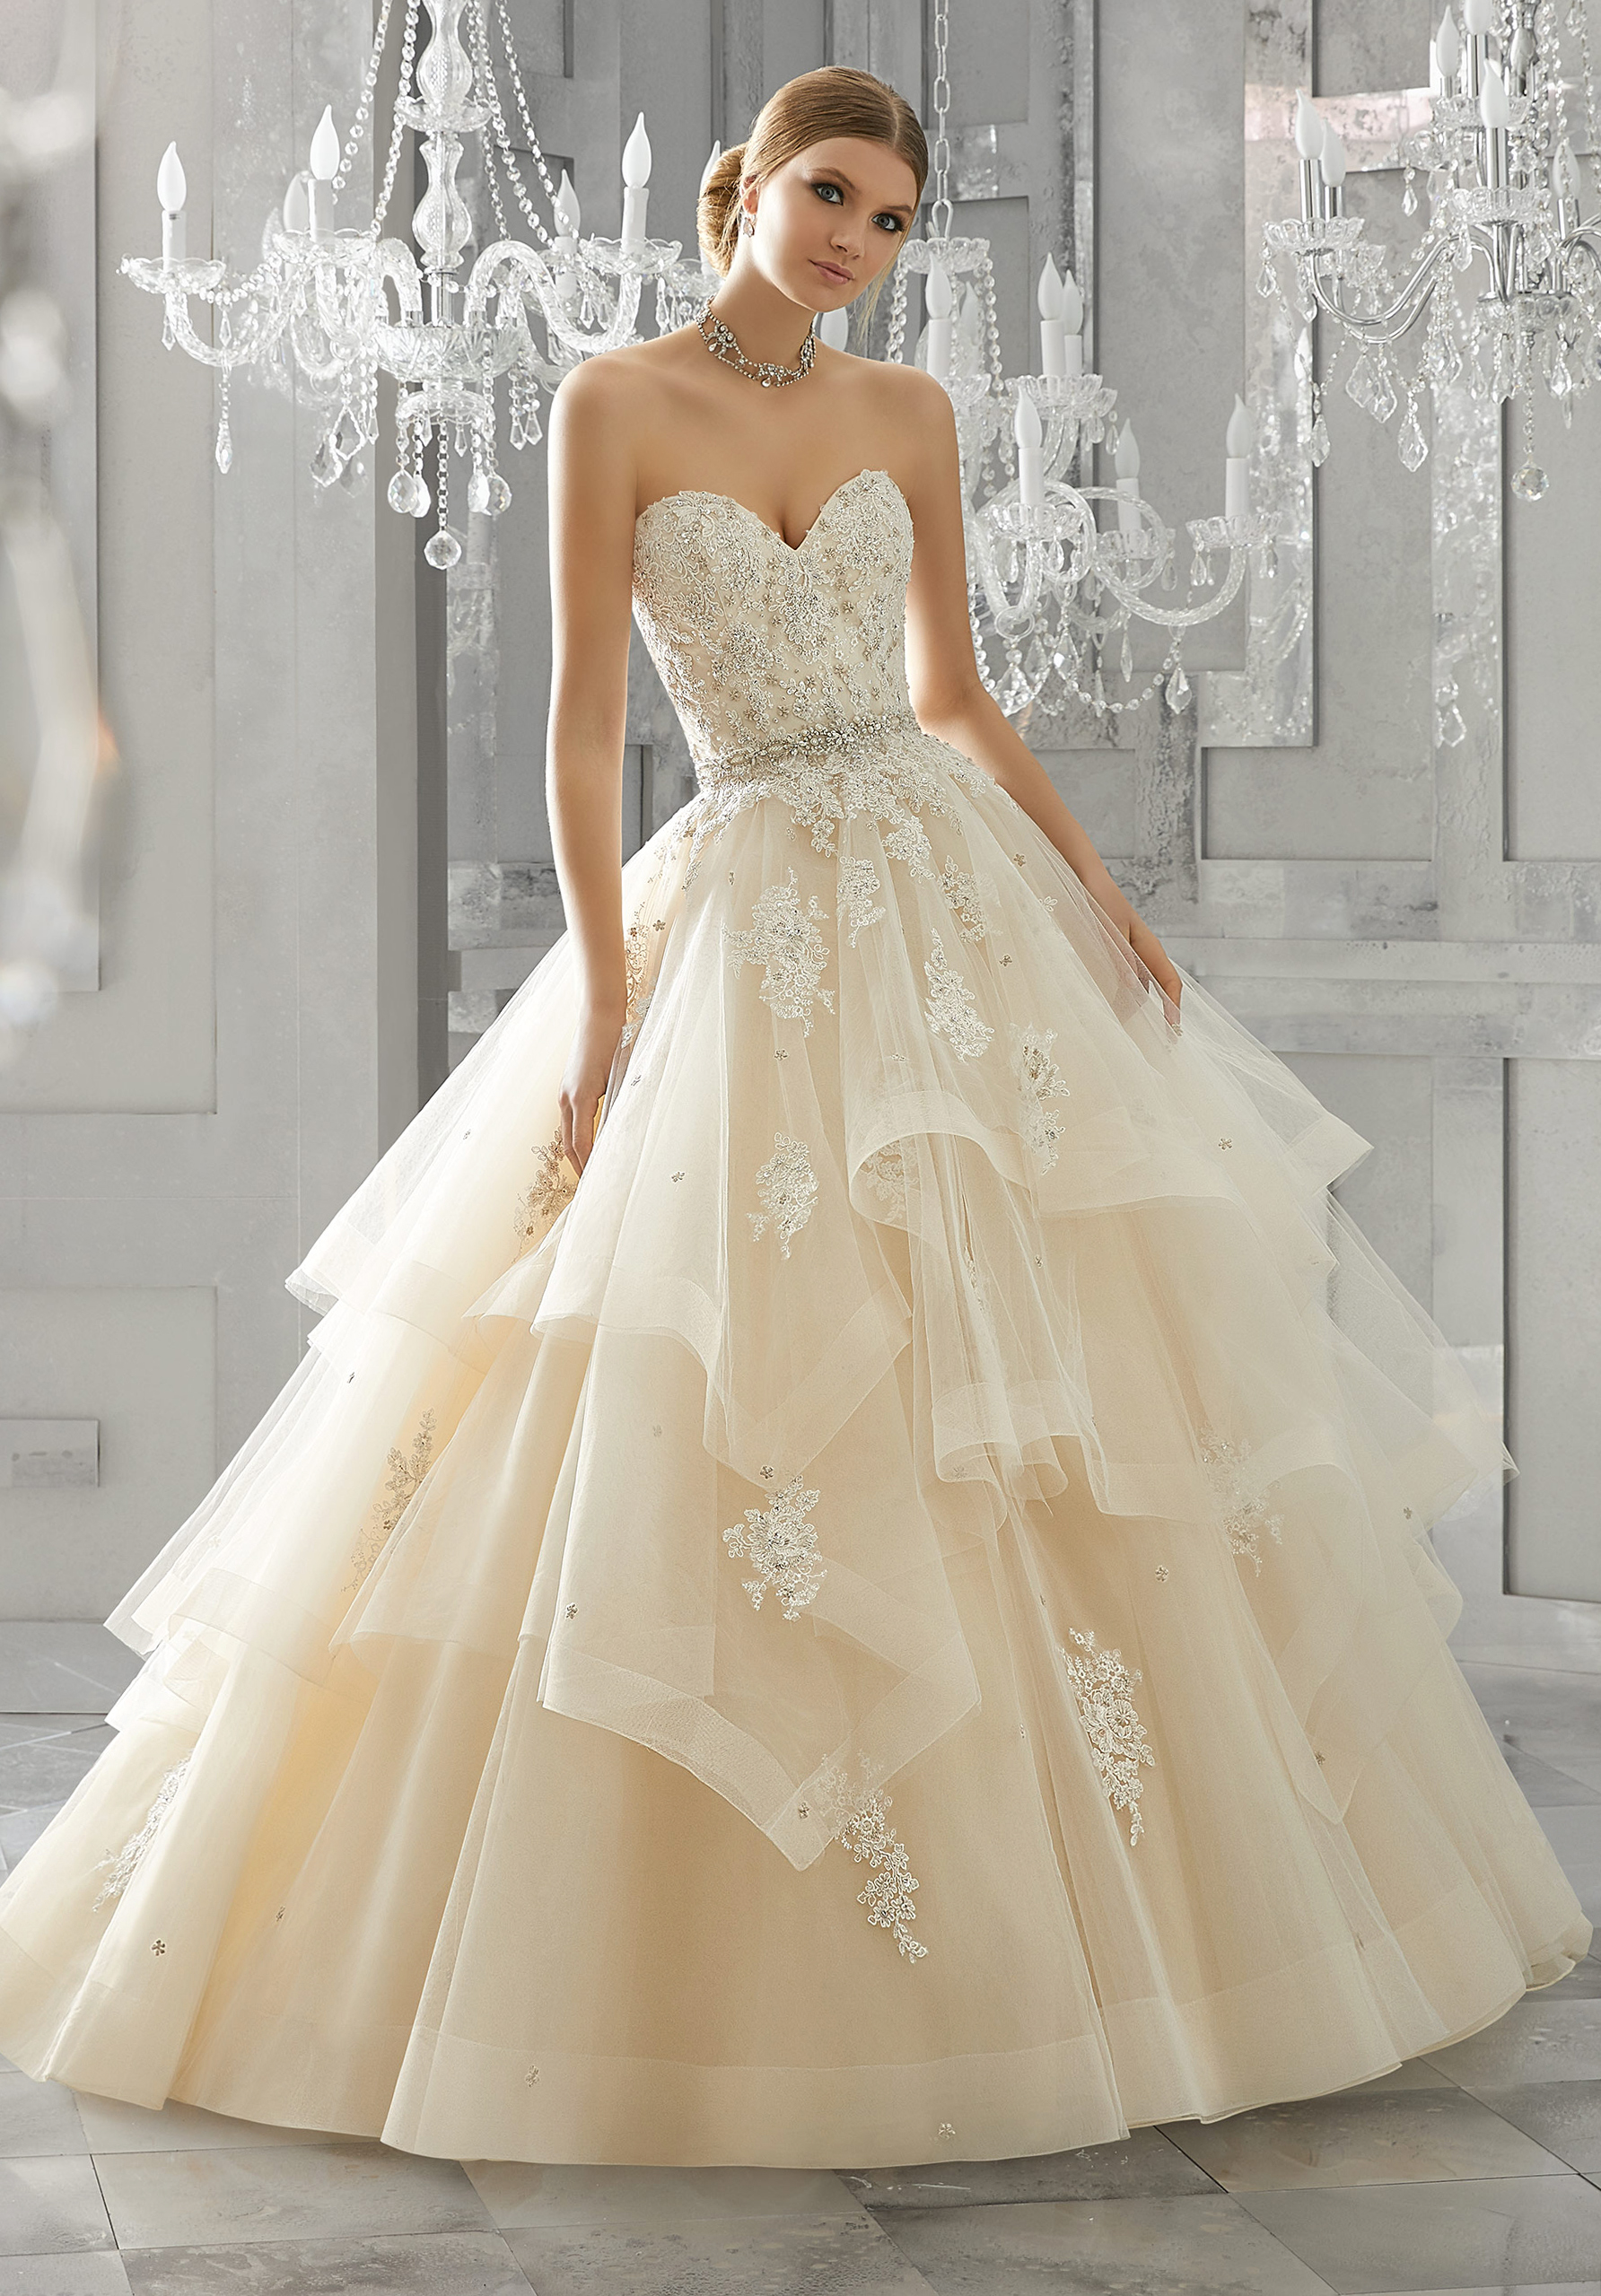 morilee wedding dress spring 2018 sweetheart tiered ballgown